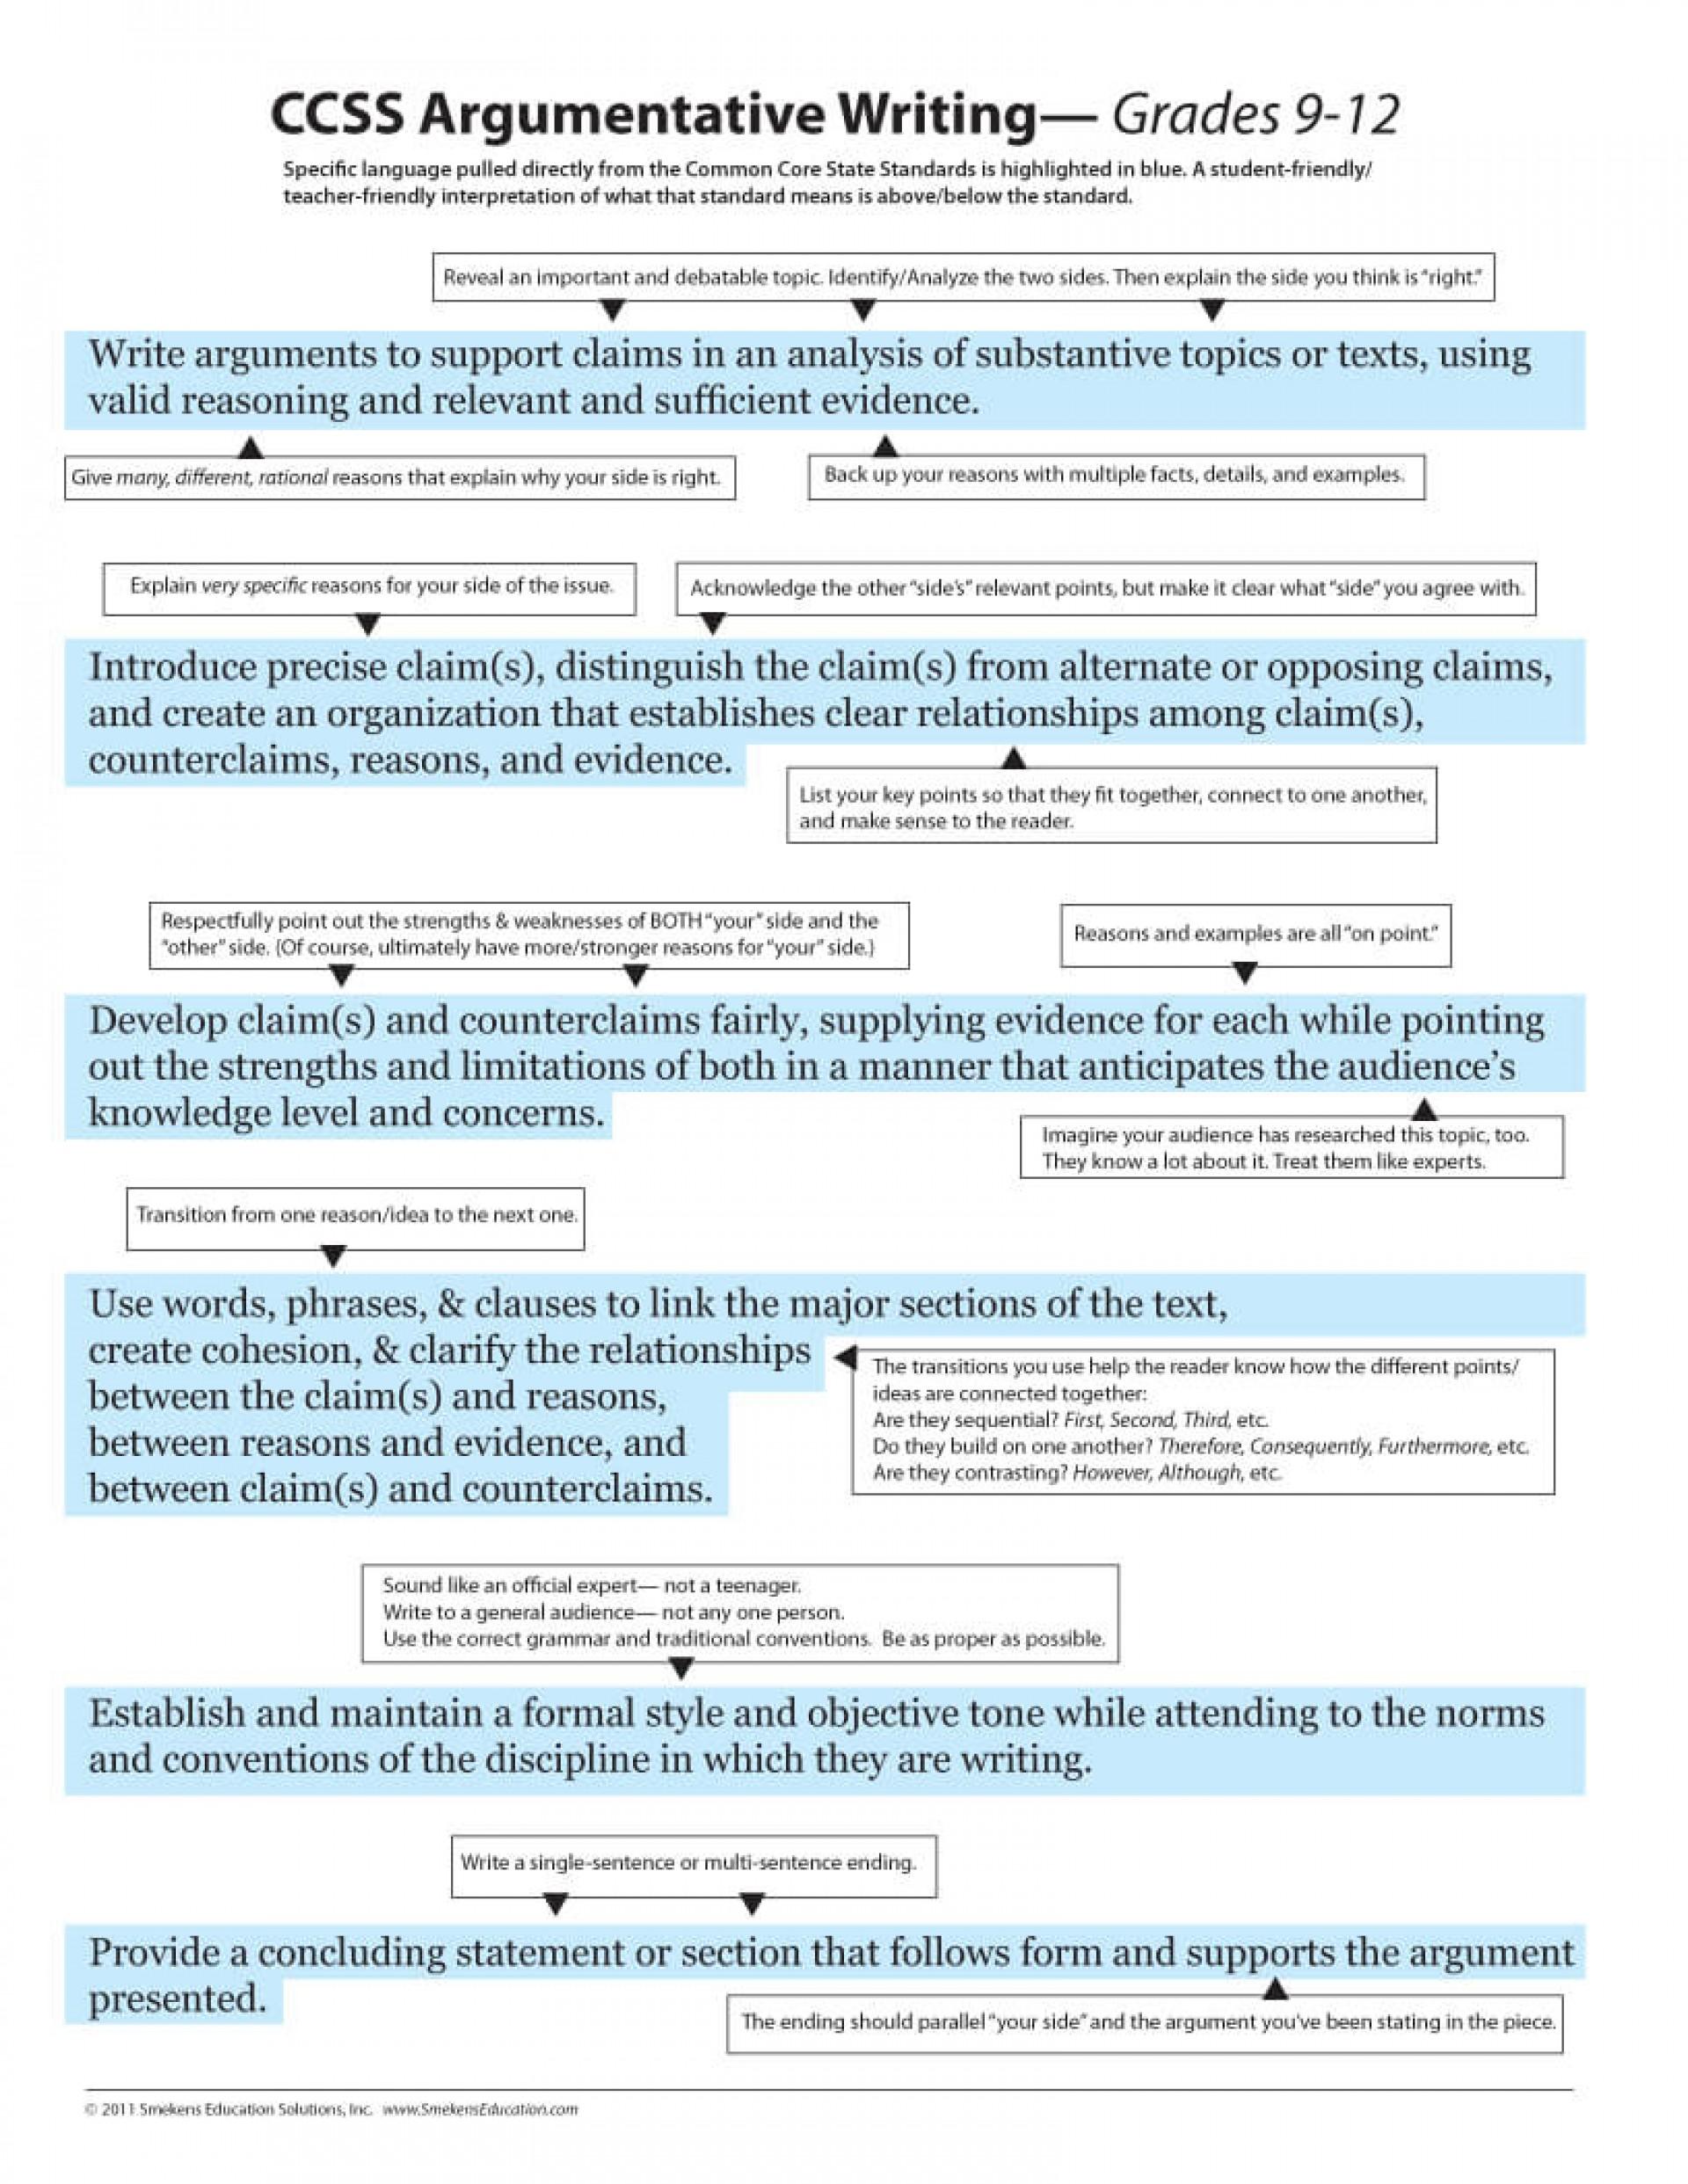 023 Outline For Persuasive Essay Ccss Argumentative Grade 9 12o Stirring Middle School Writing 1920